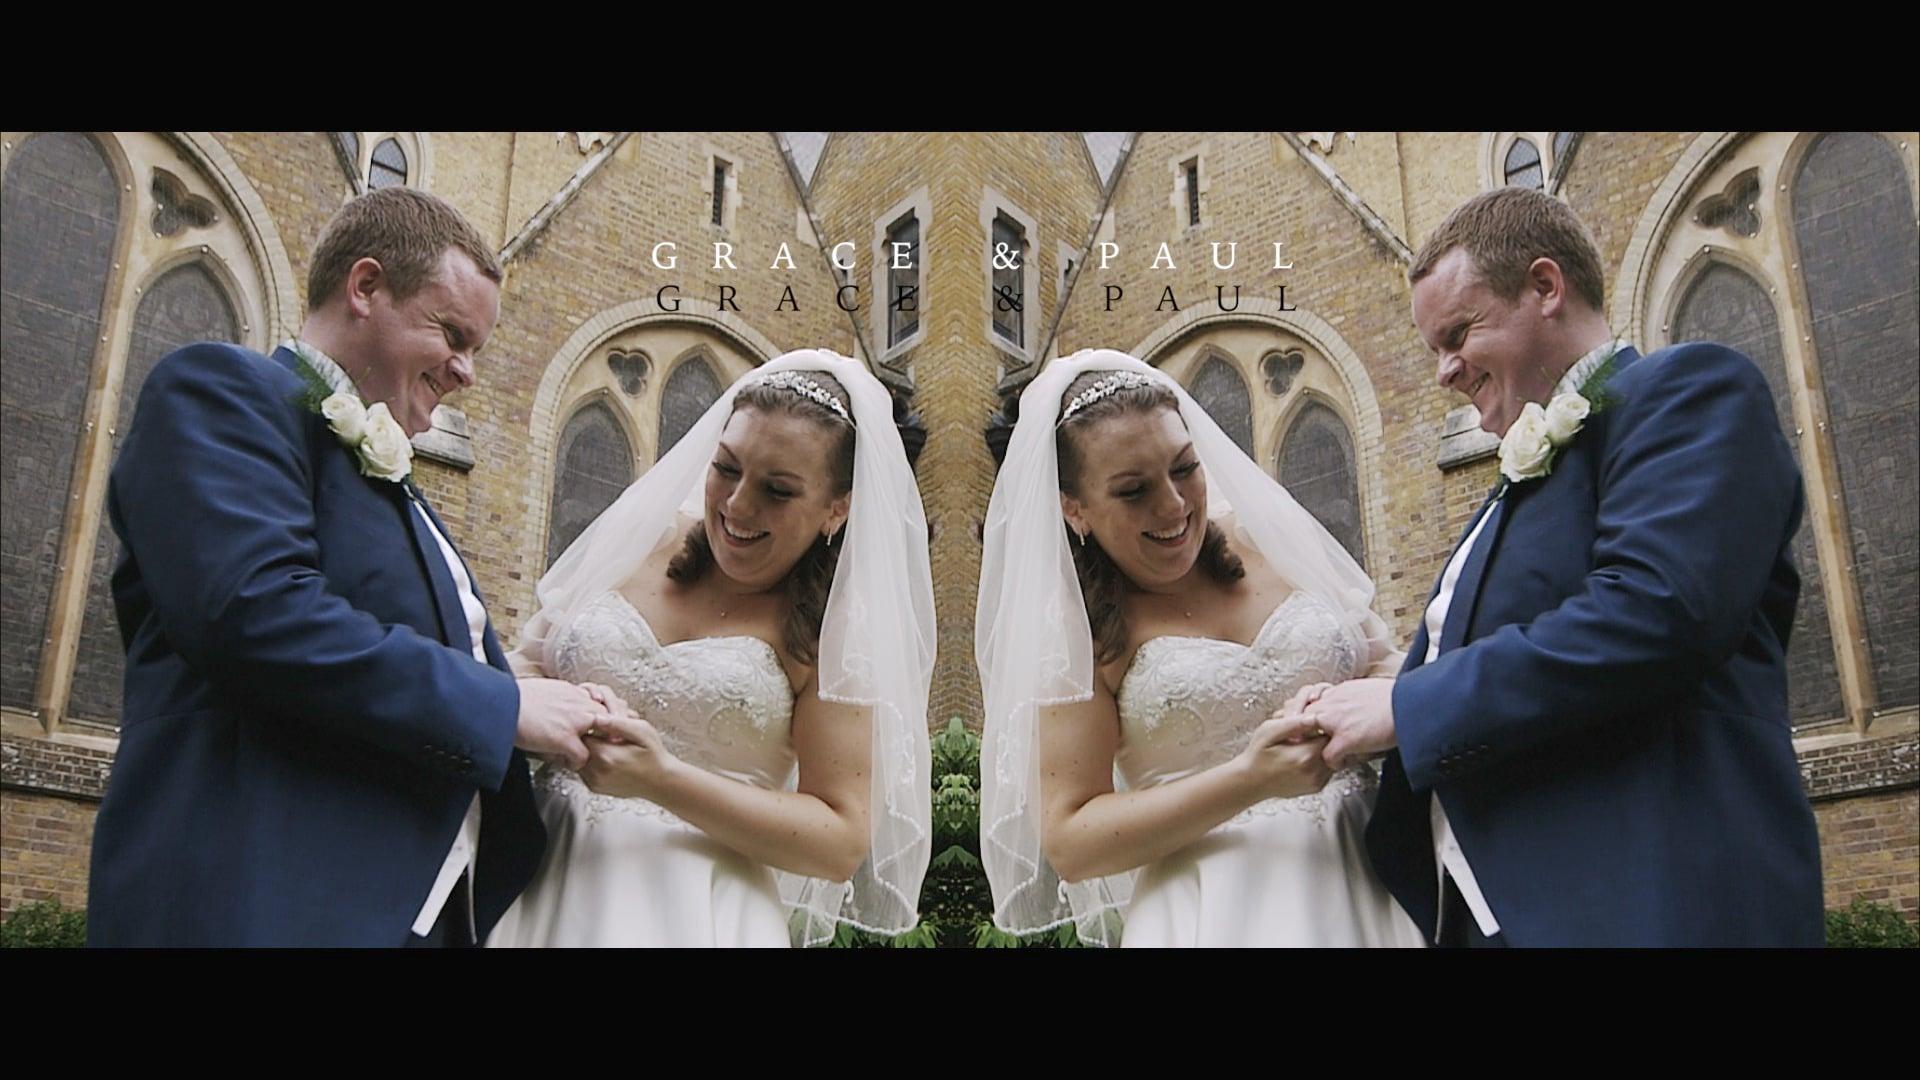 Grace and Paul | Wedding film